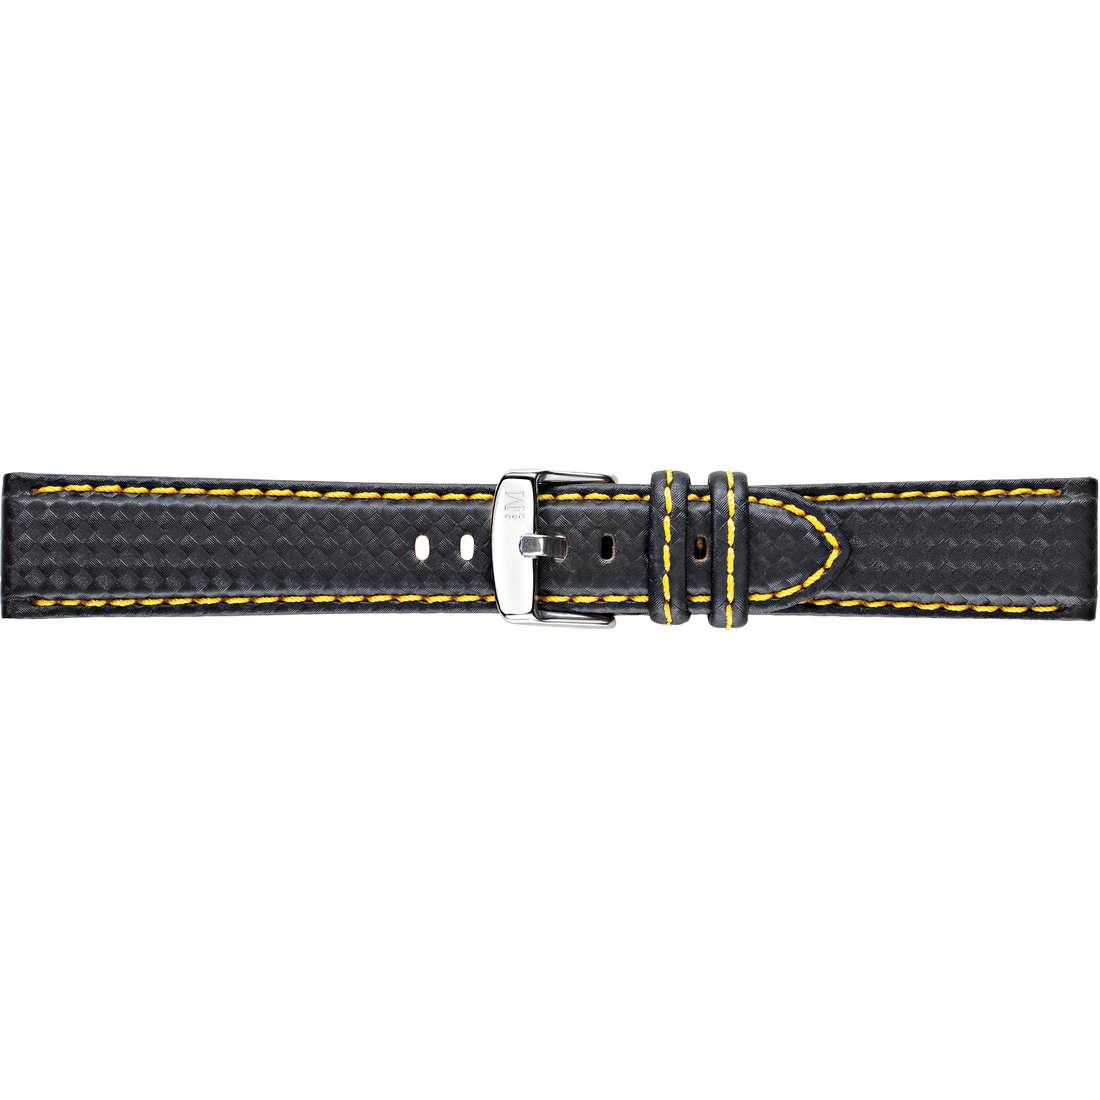 montre bande de montres homme Morellato Linea Sport A01U3586977897CR24